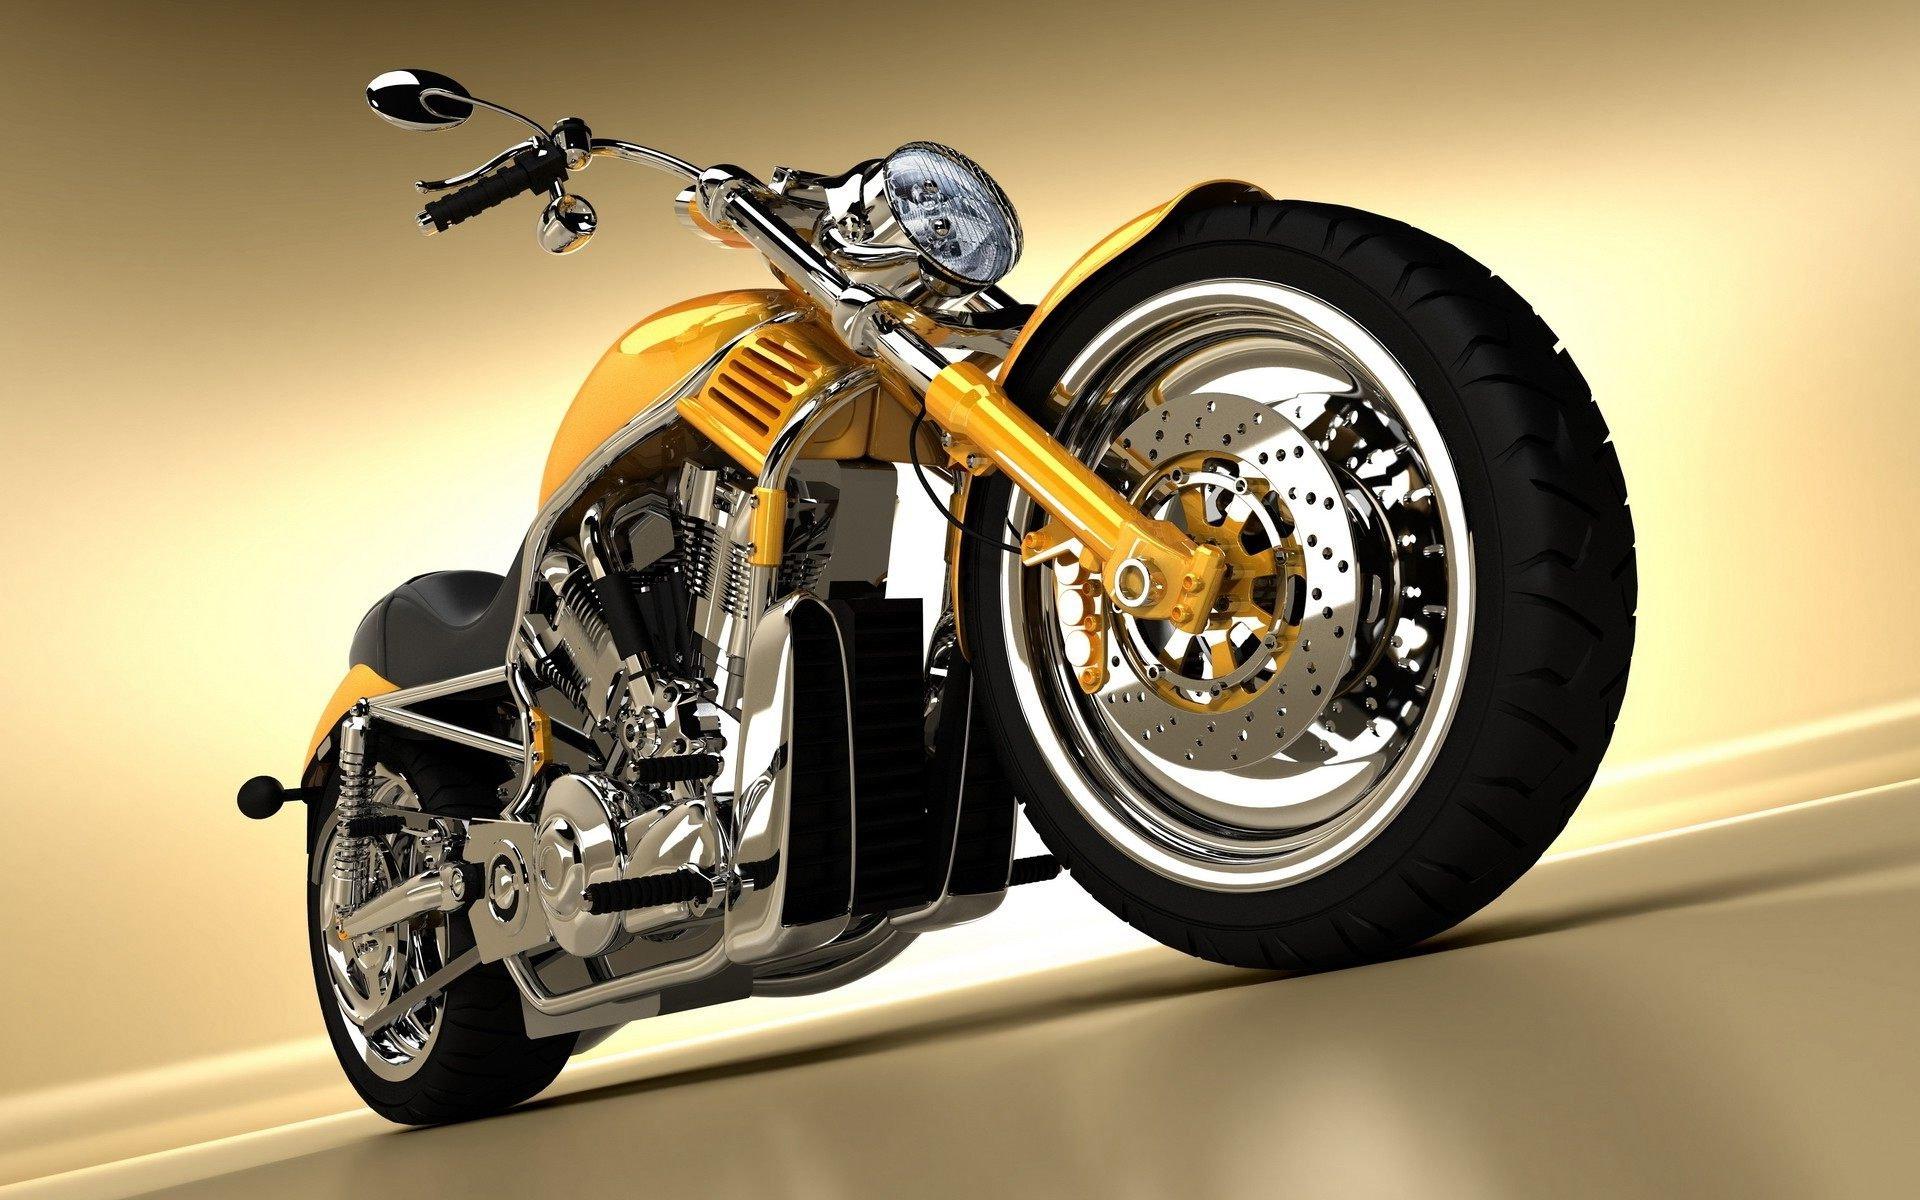 Image: Motorcycle, Harley Davidson, yellow, molding, wheels, handlebar, headlight, mirror